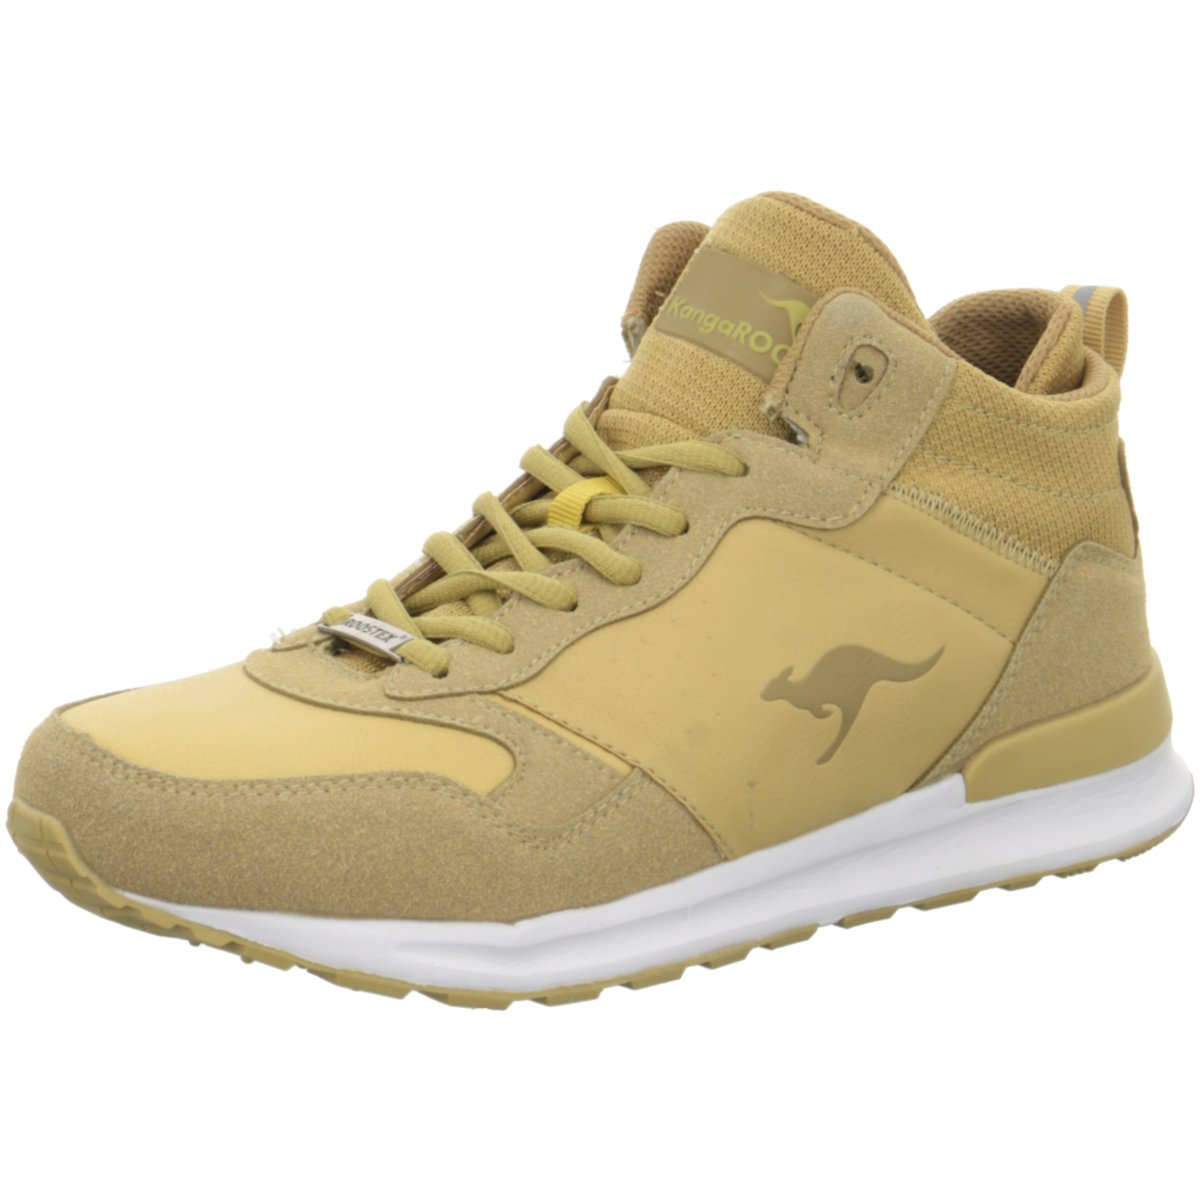 NEU KangaROOS Herren Sneaker amber Wheat 79026/1000 beige 352398